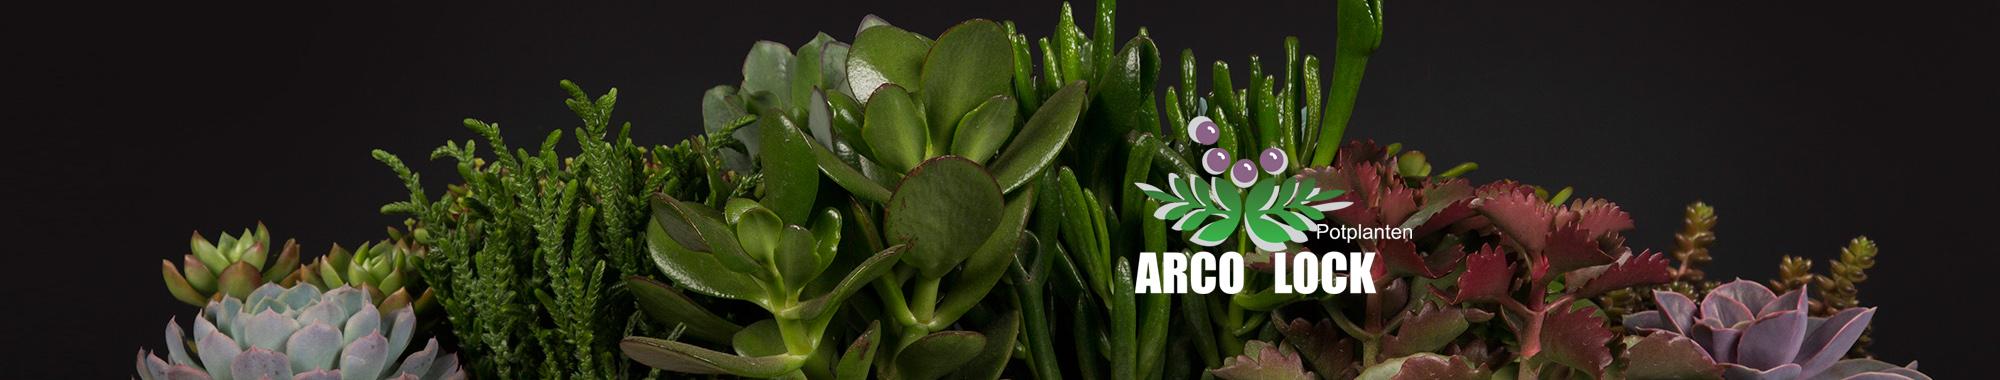 Arco Lock Potplanten